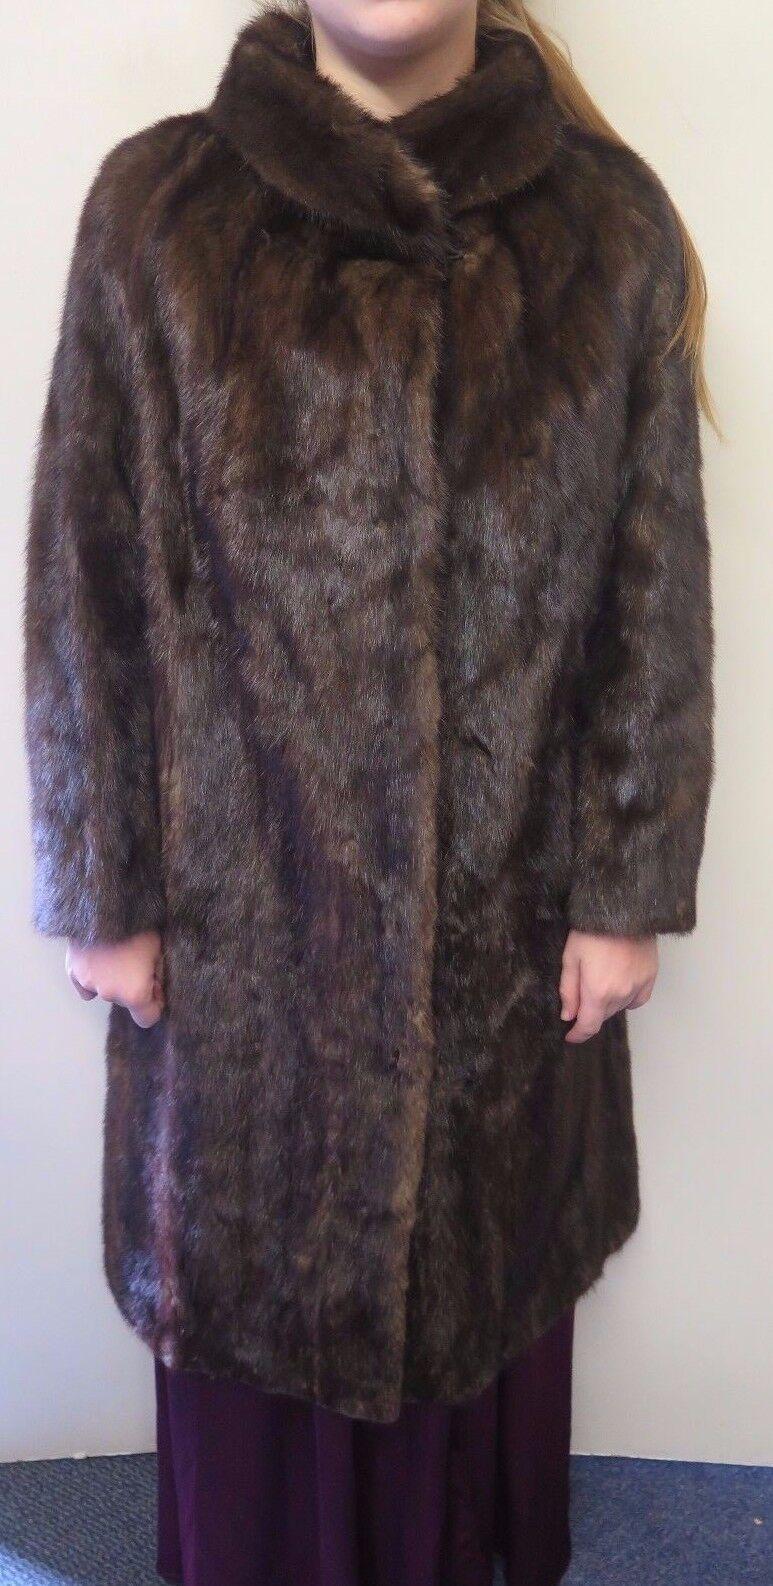 Vintage Europeo Genuino  Marrón Oscuro de Piel de visón largo abrigo L 14 euro 42  marcas de diseñadores baratos